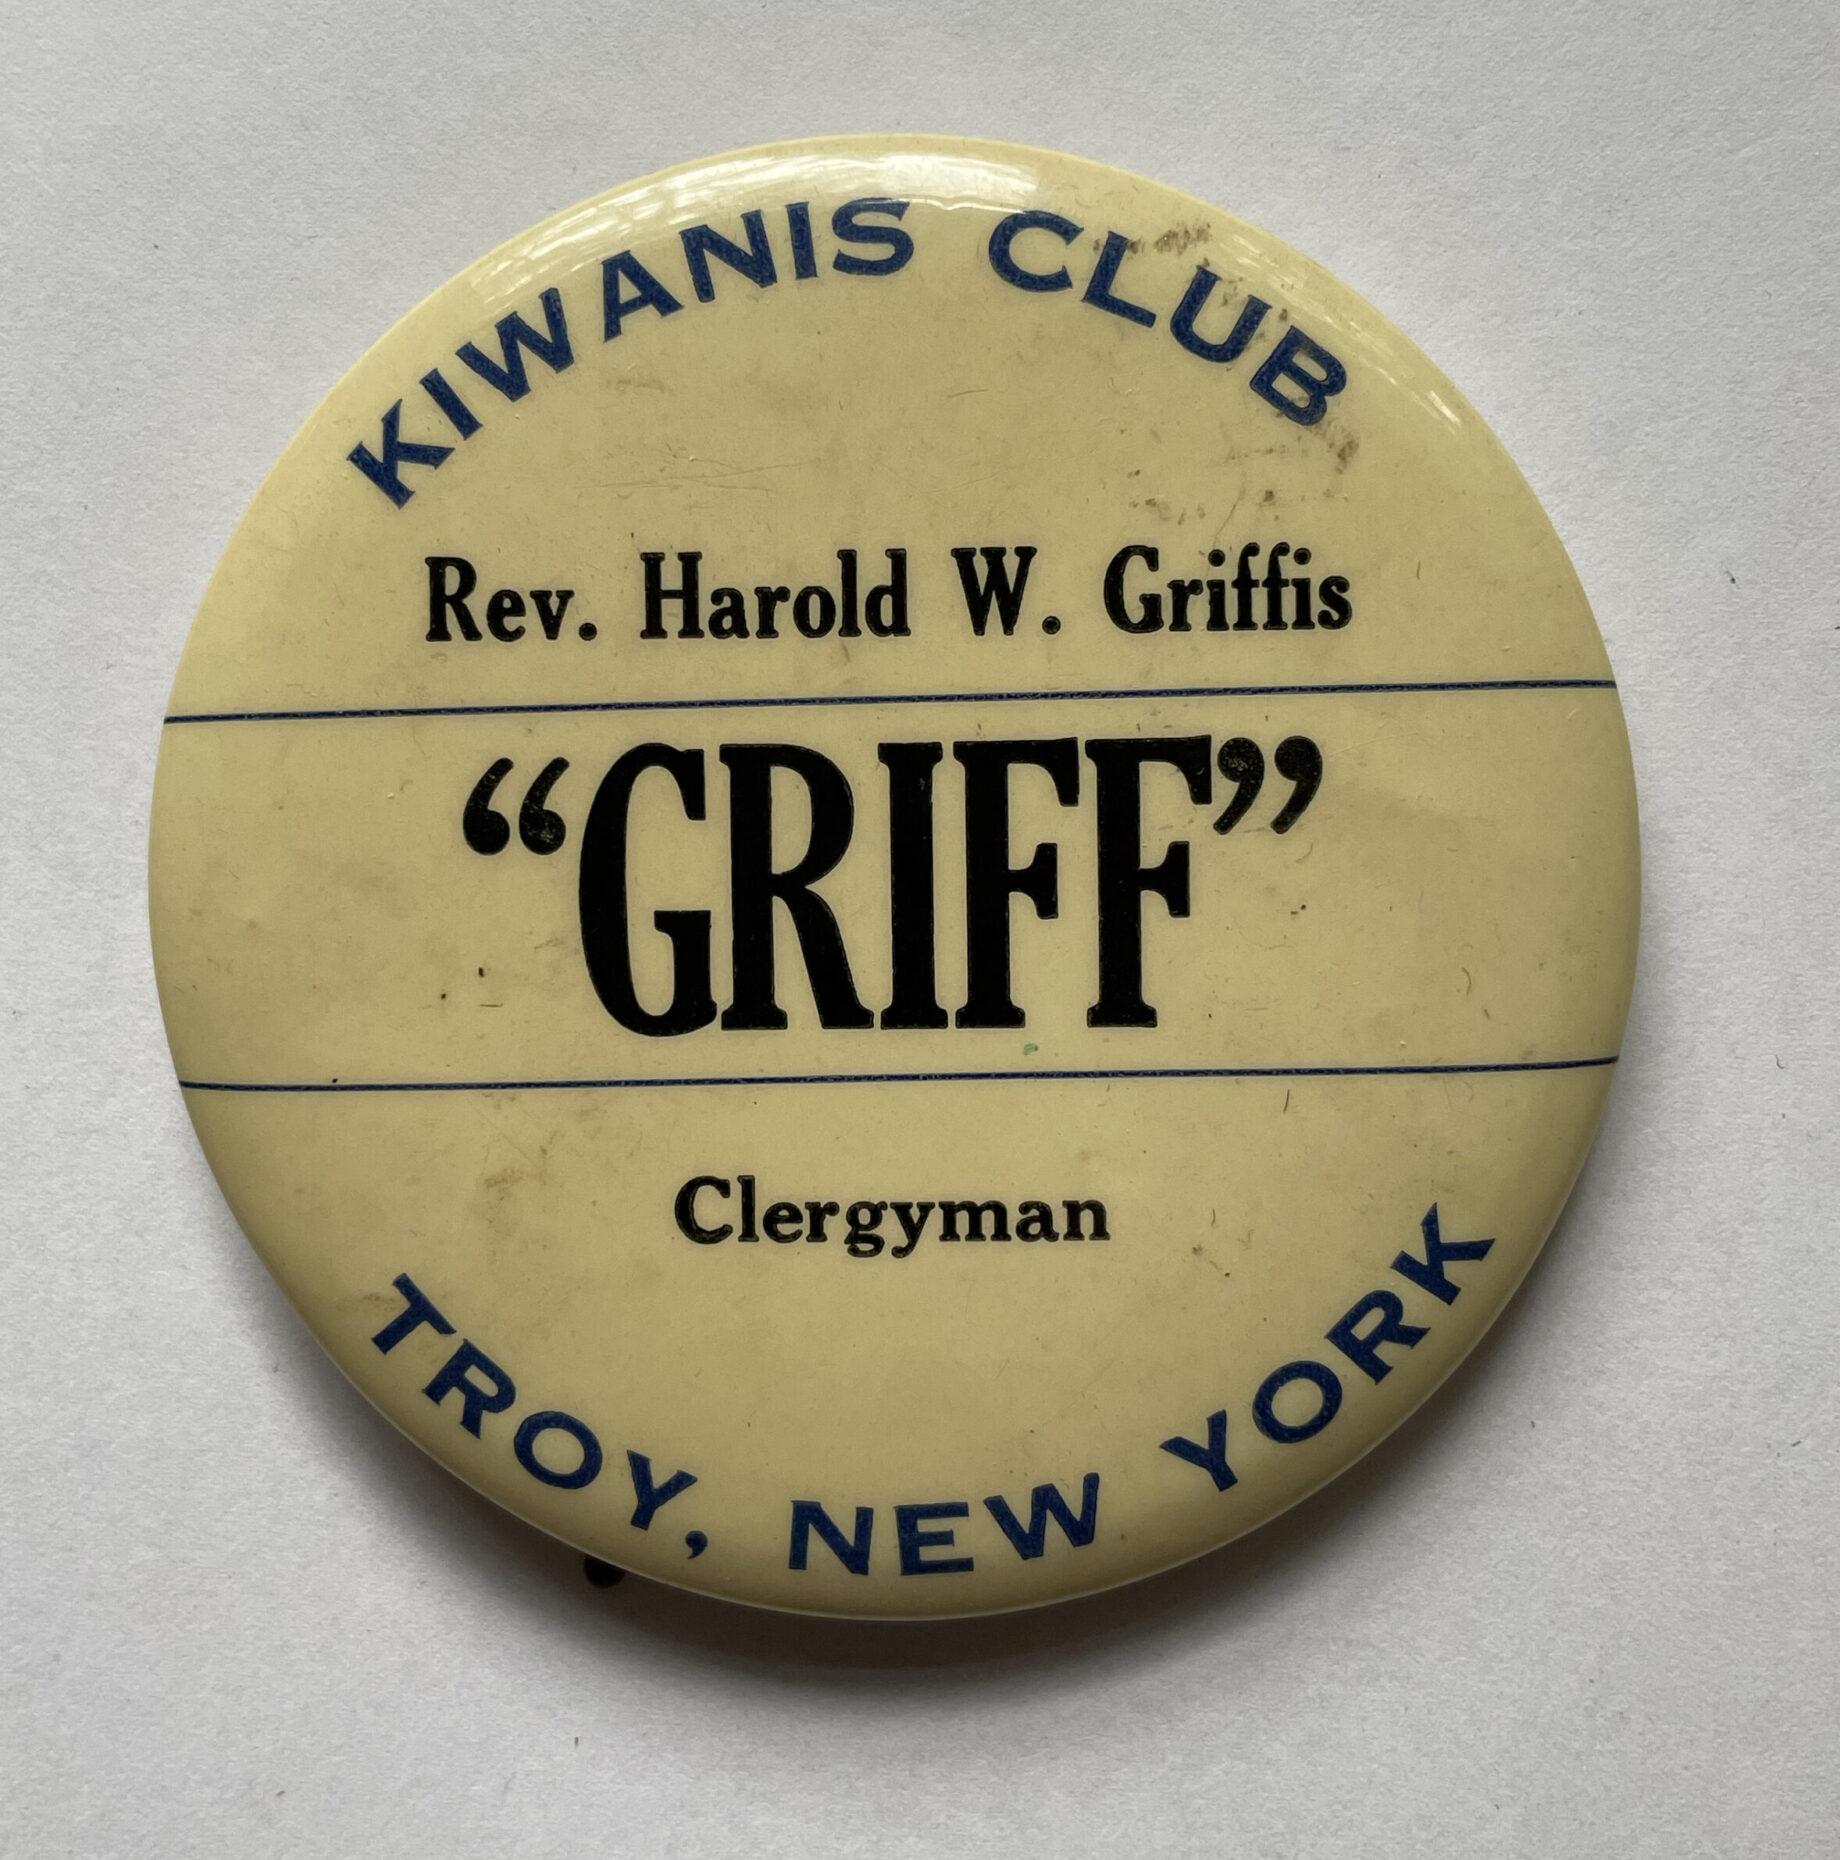 Griff Kiwanas Club